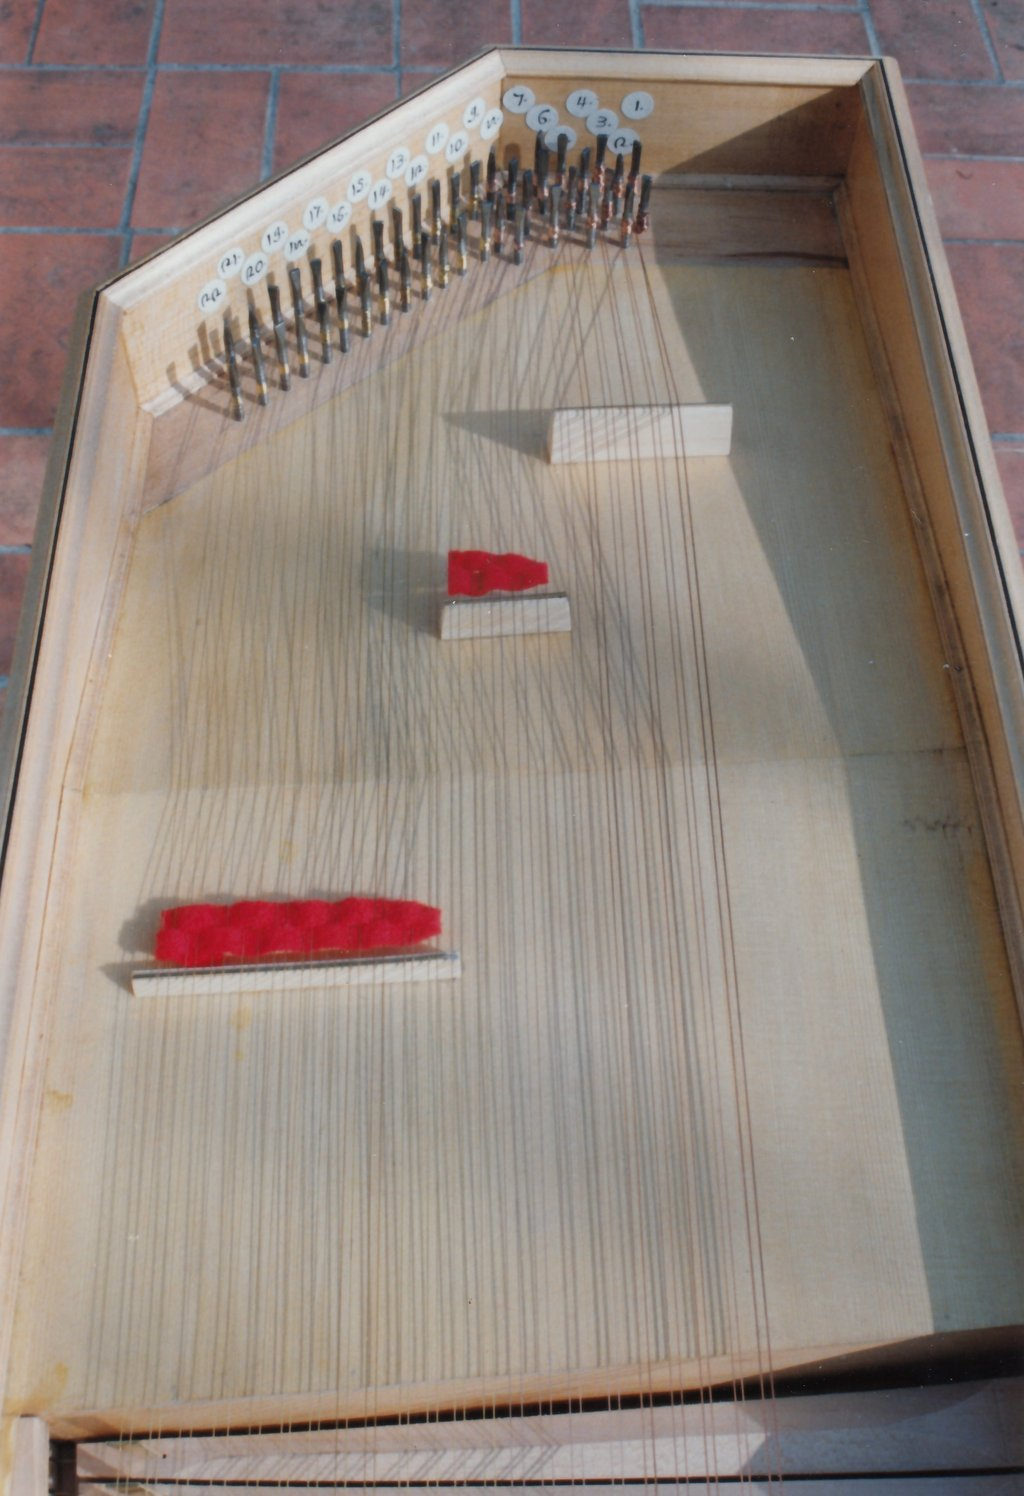 Fabrication d'instruments de musique anciens de bgire MJQ3Ib-1992-Clavicorde-Pisaurensis-43